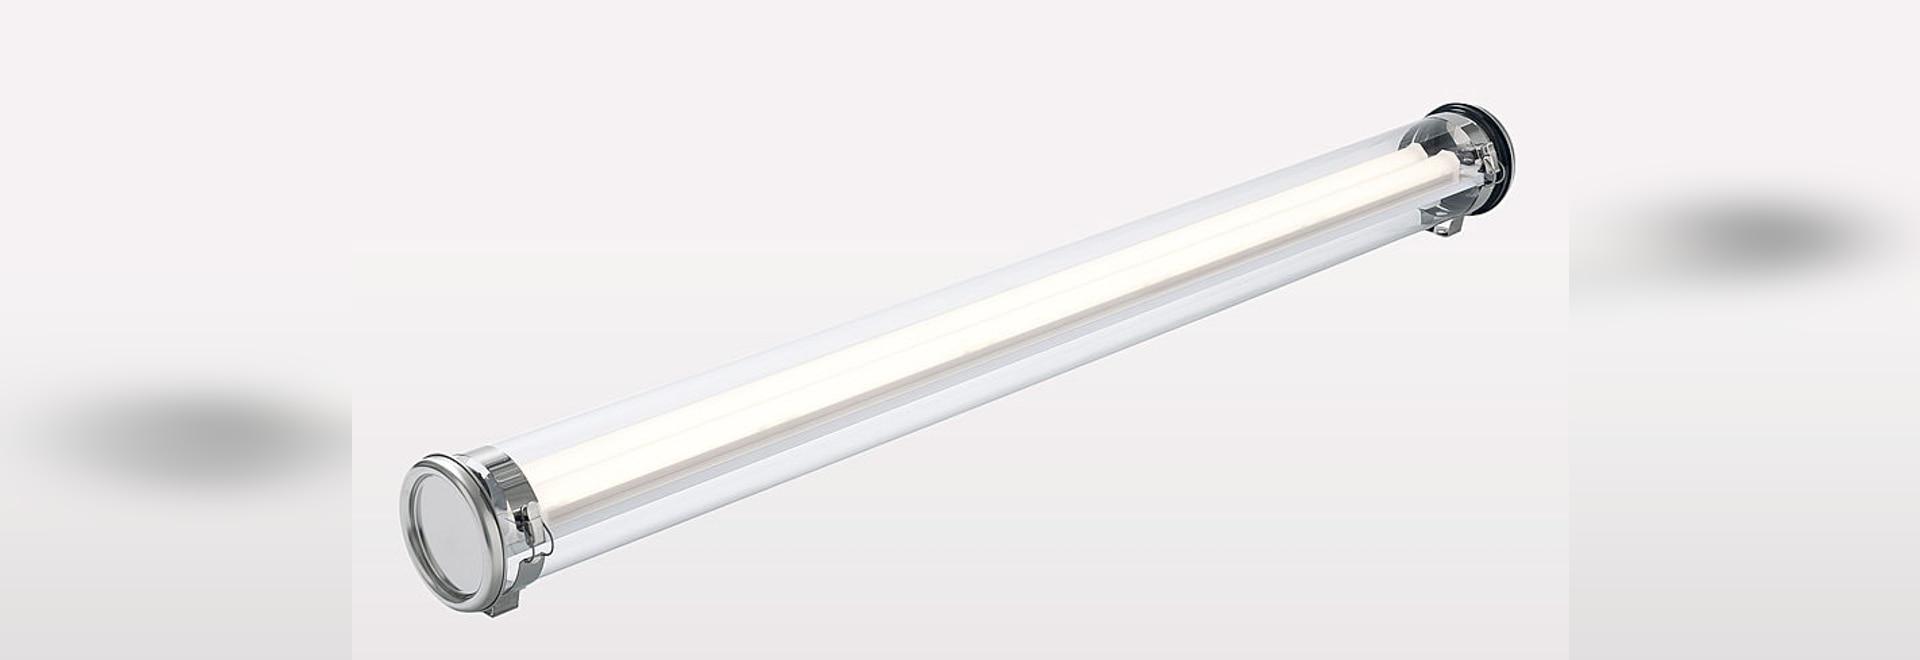 JAMIN 133, the hermetic luminaire for ATEX Zones 2, 21 and 22